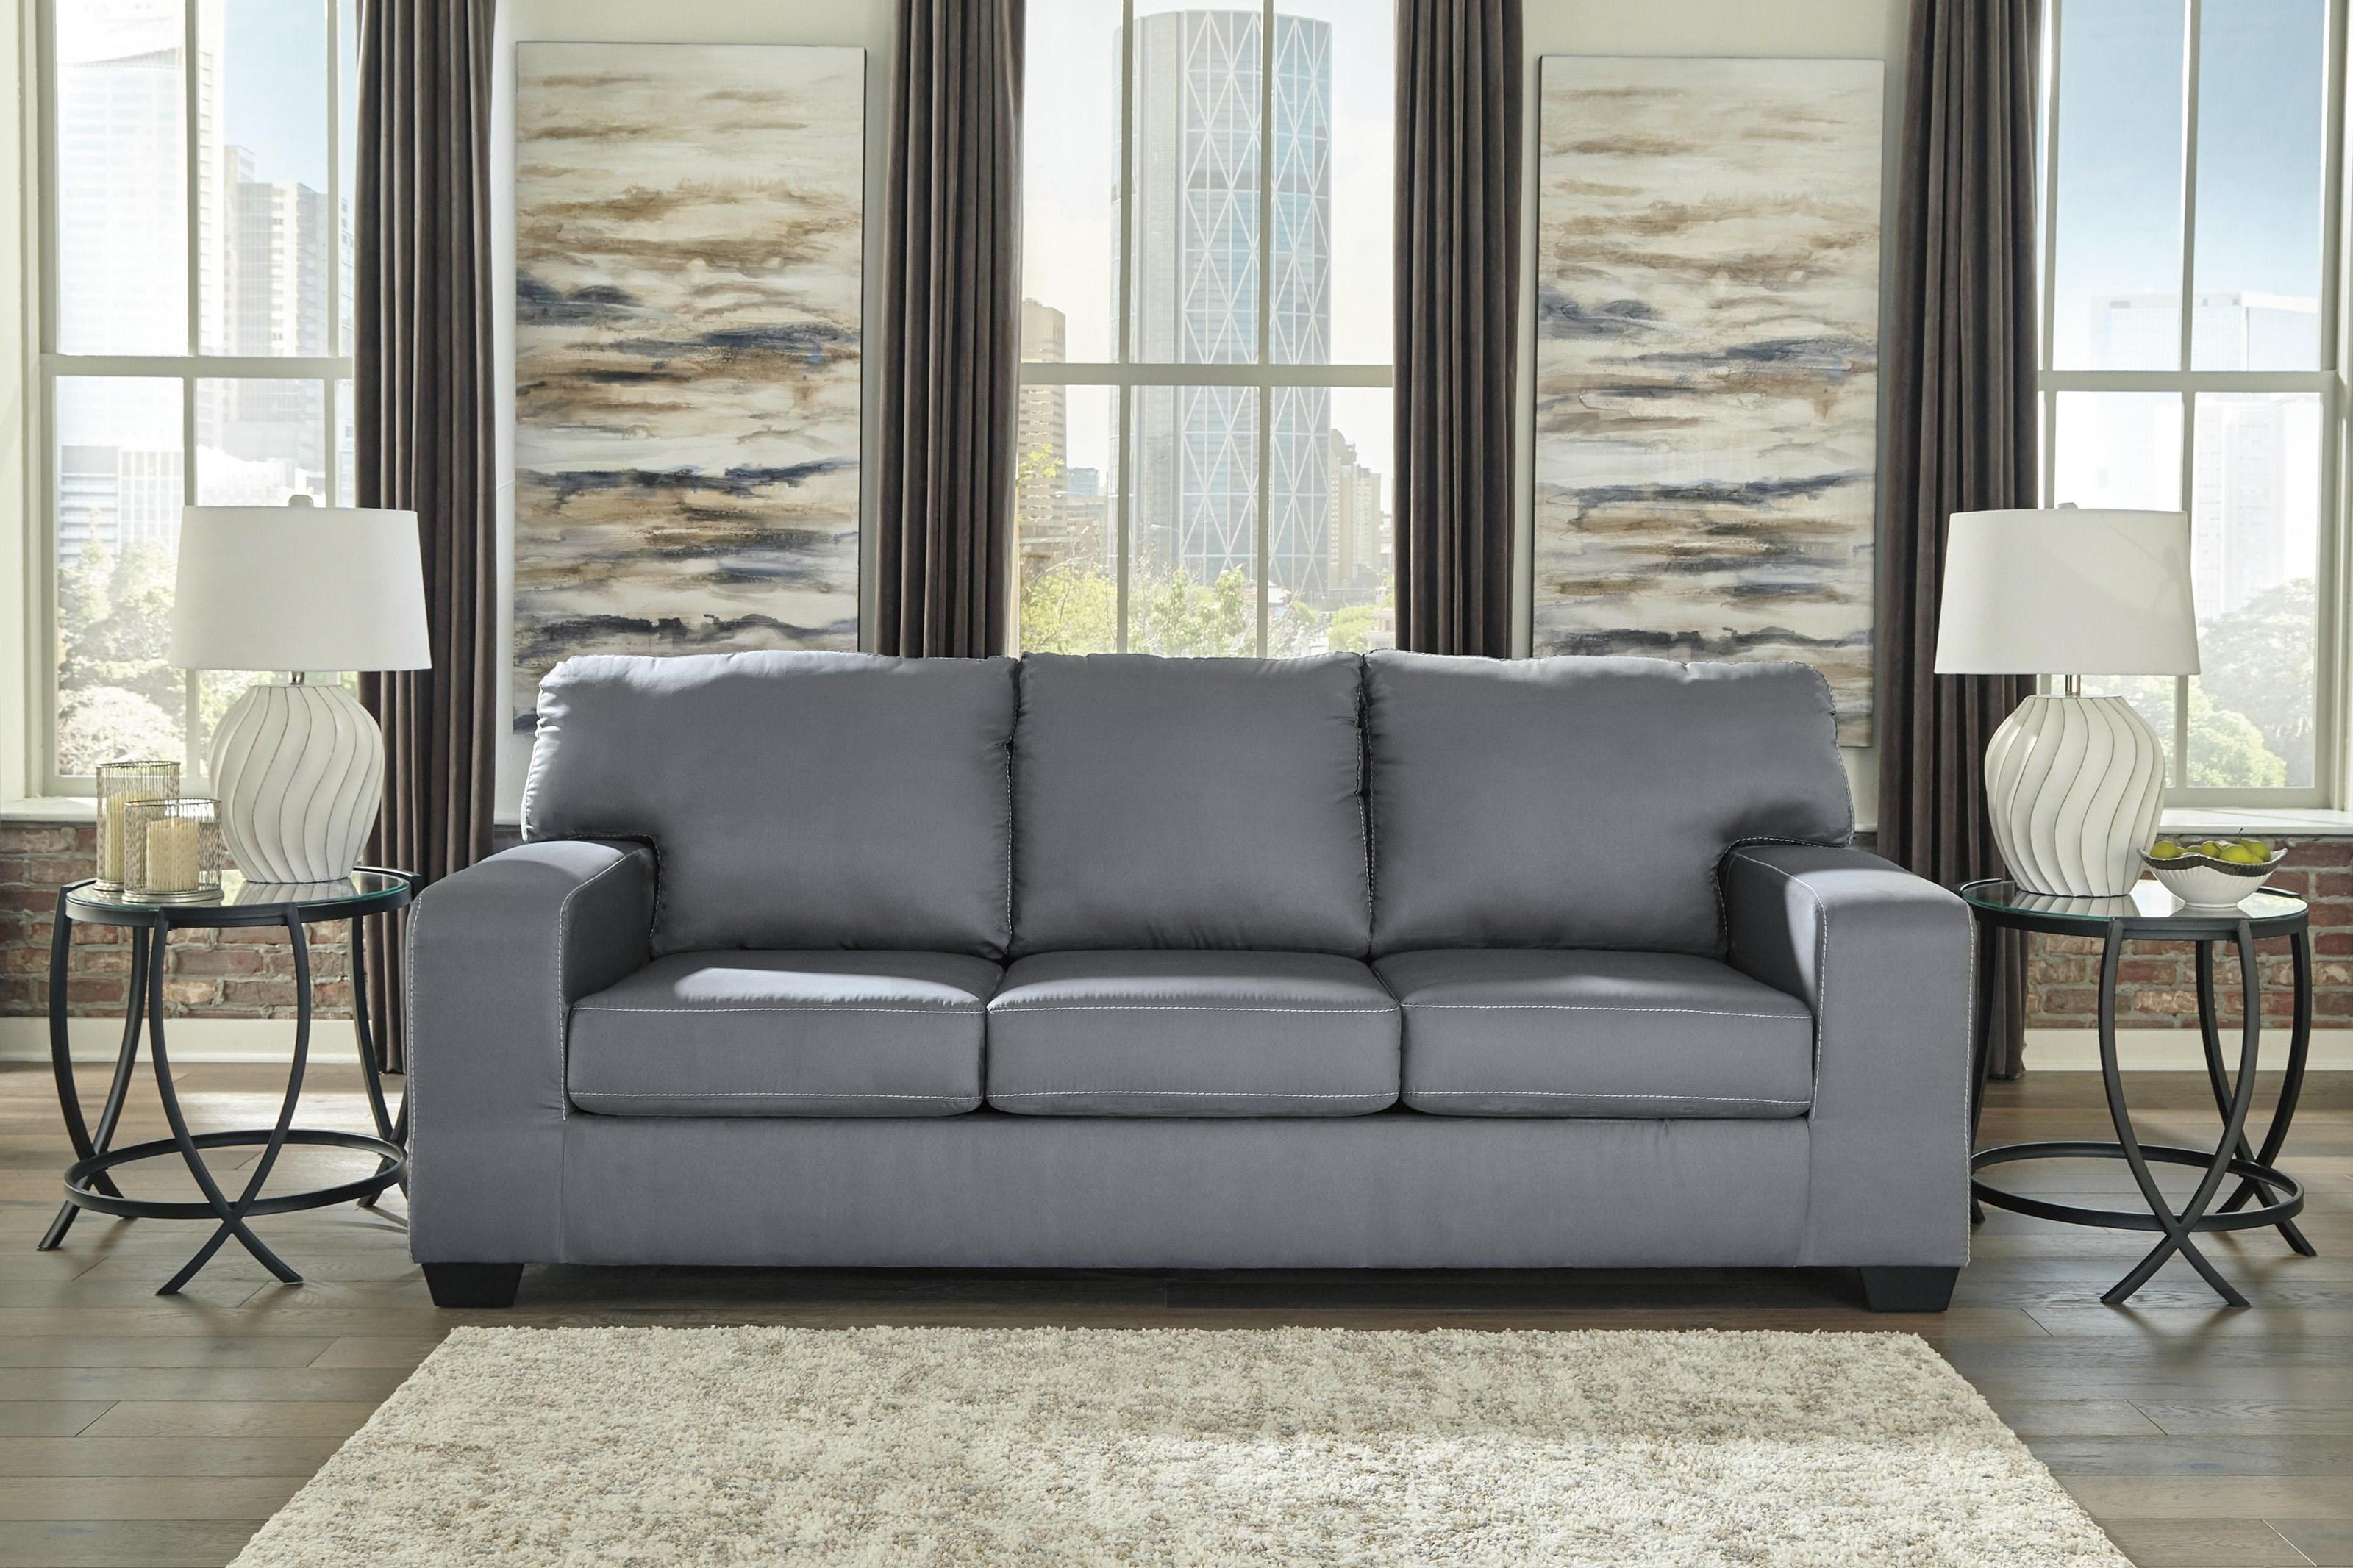 Kanosh Contemporary Sofa Sleeper by Ashley Furniture at Sam Levitz Furniture